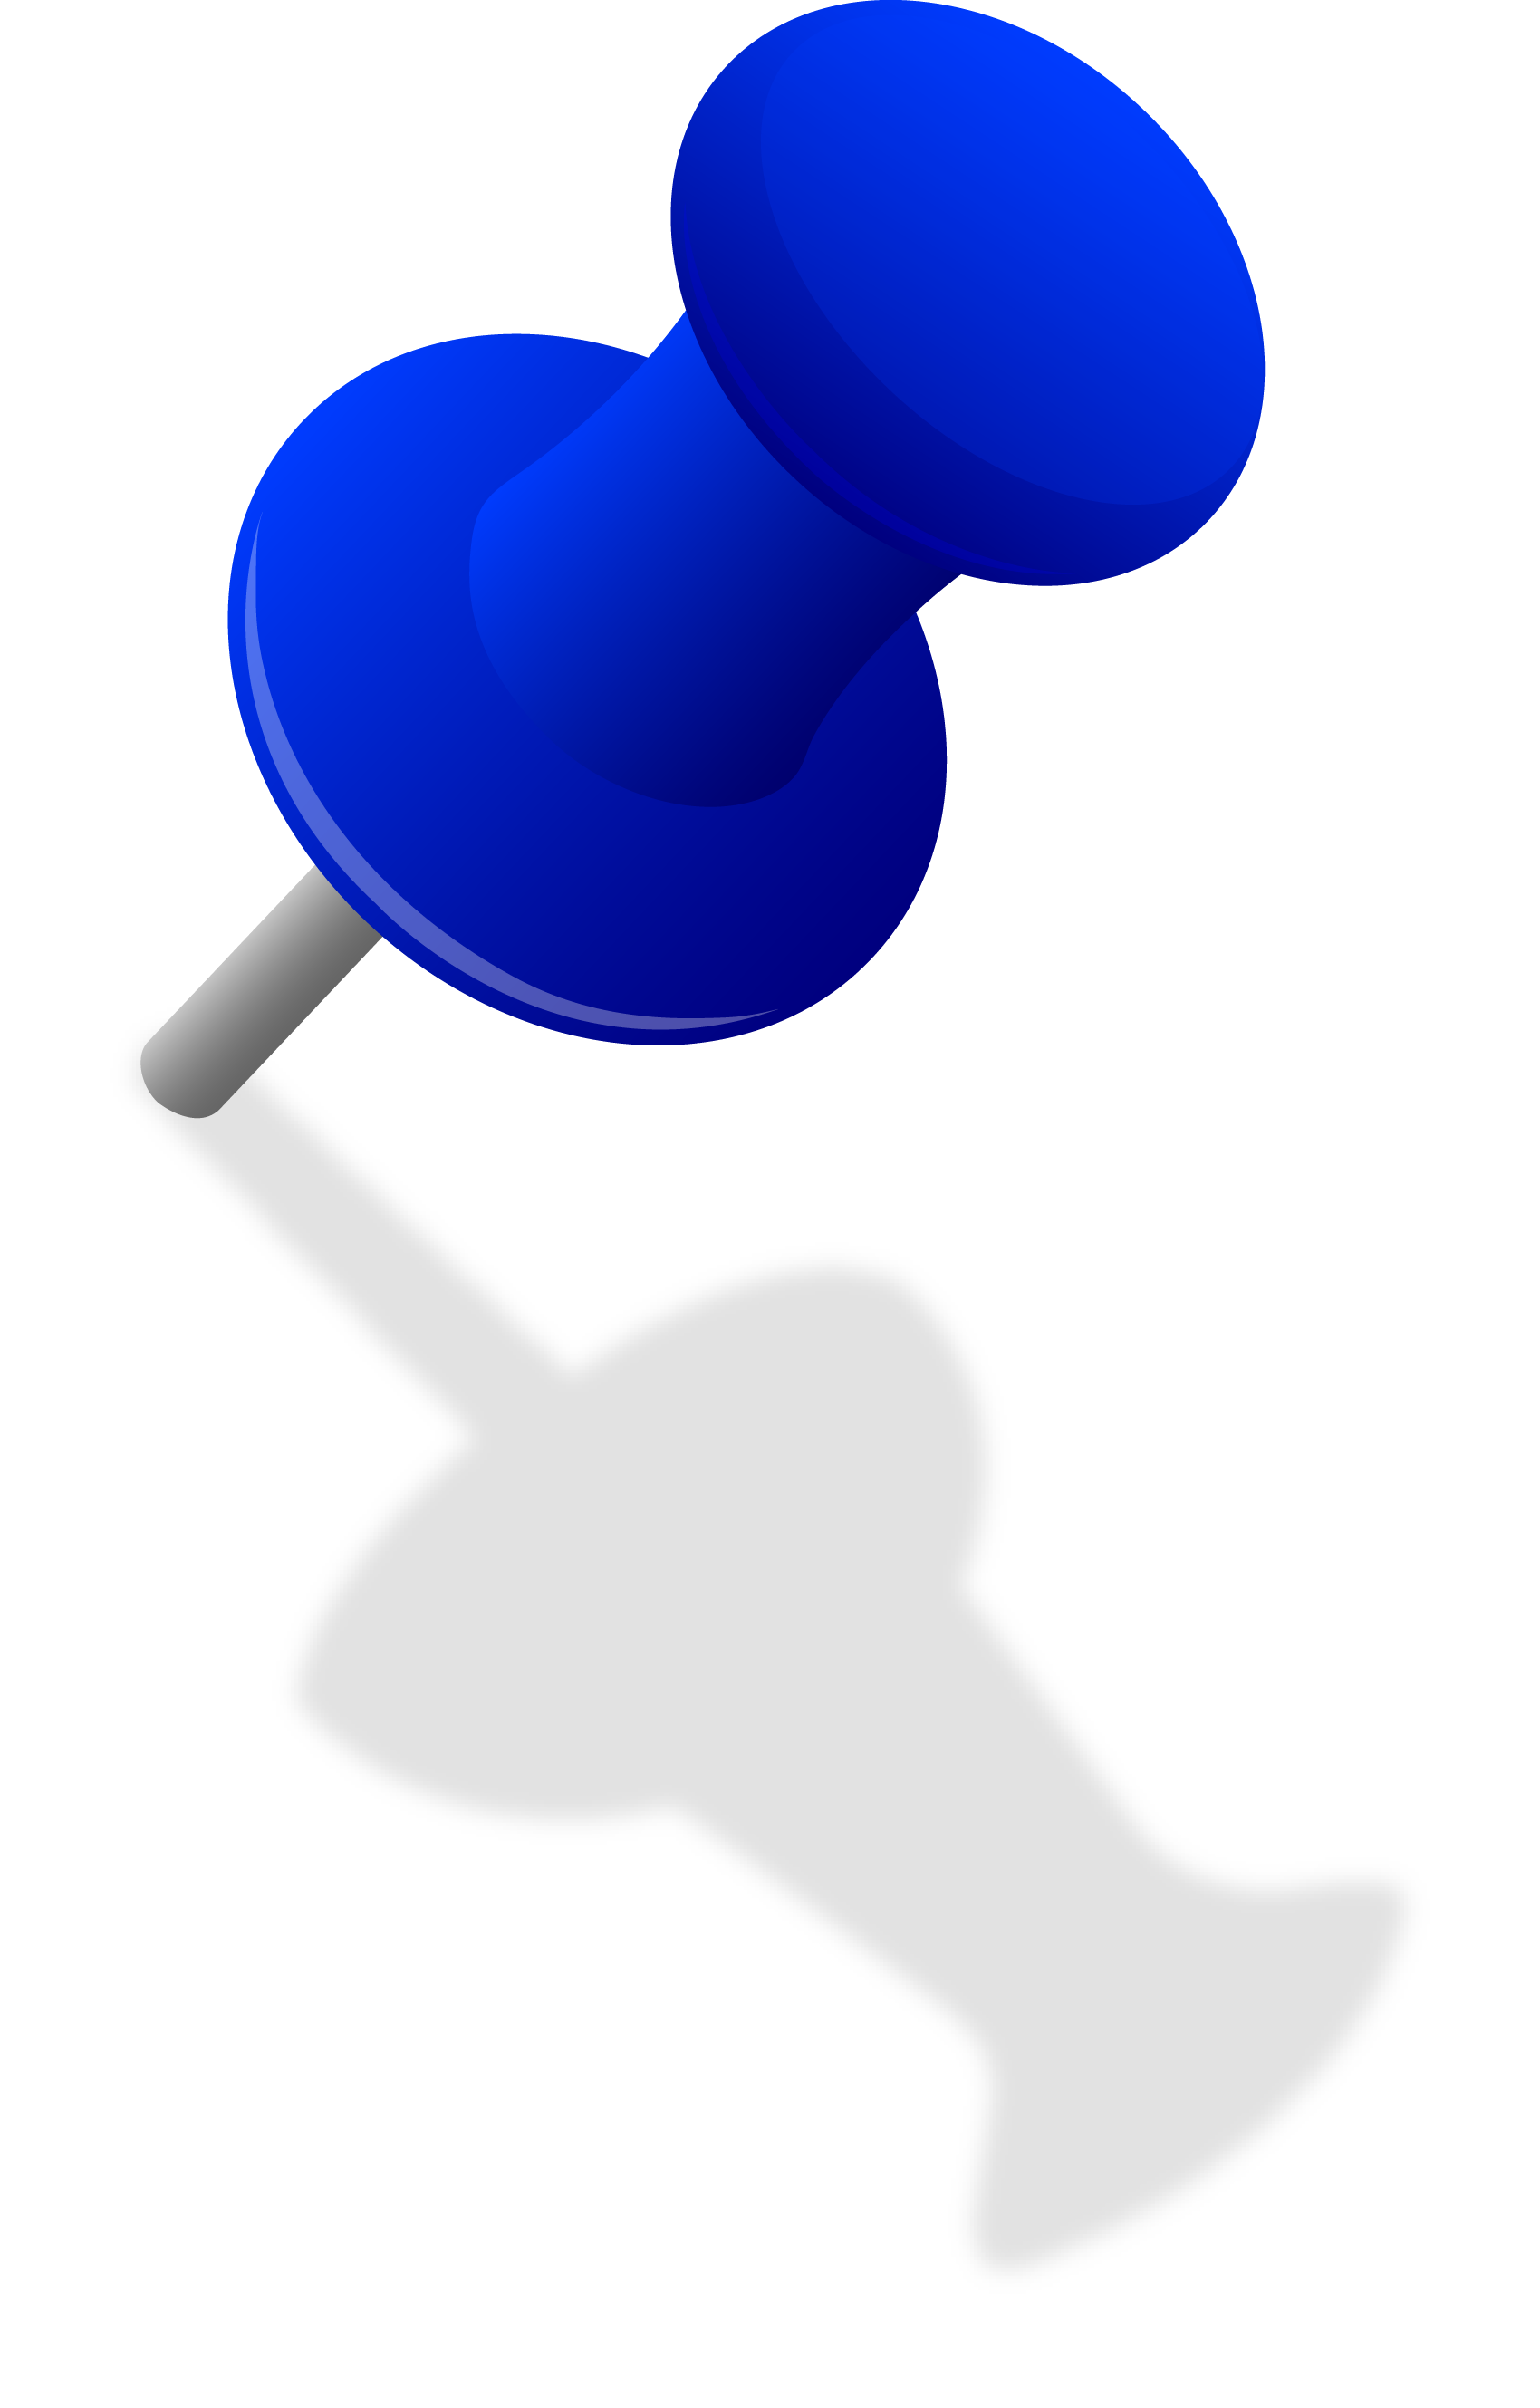 Push Pin Clipart - Clipartall .-Push Pin Clipart - clipartall .-7